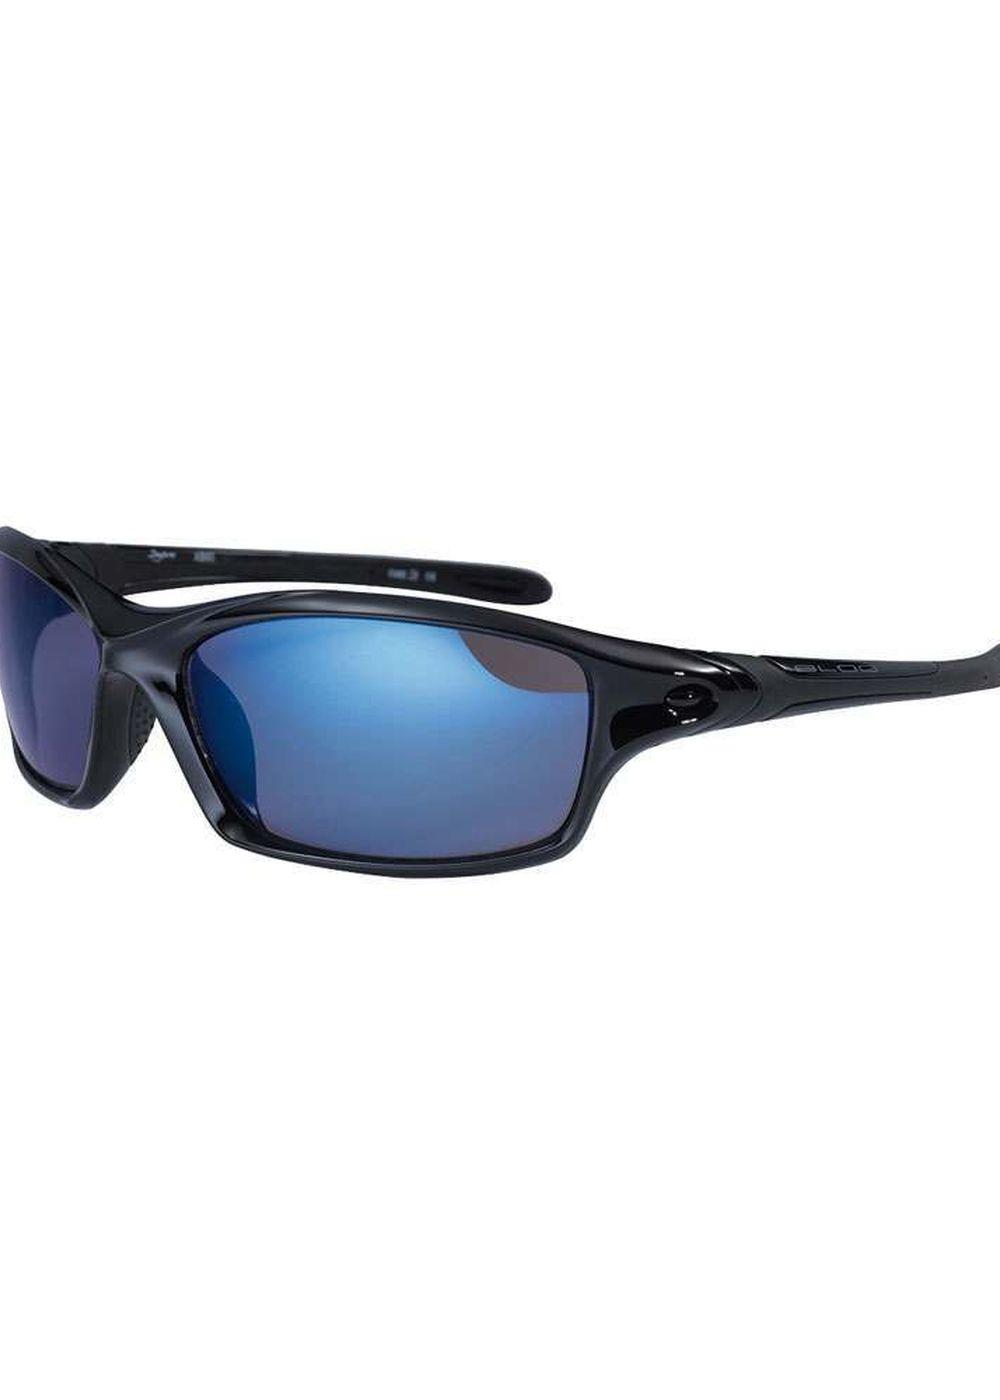 bloc-daytona-sunglasses-shiny-blackblue-mirror